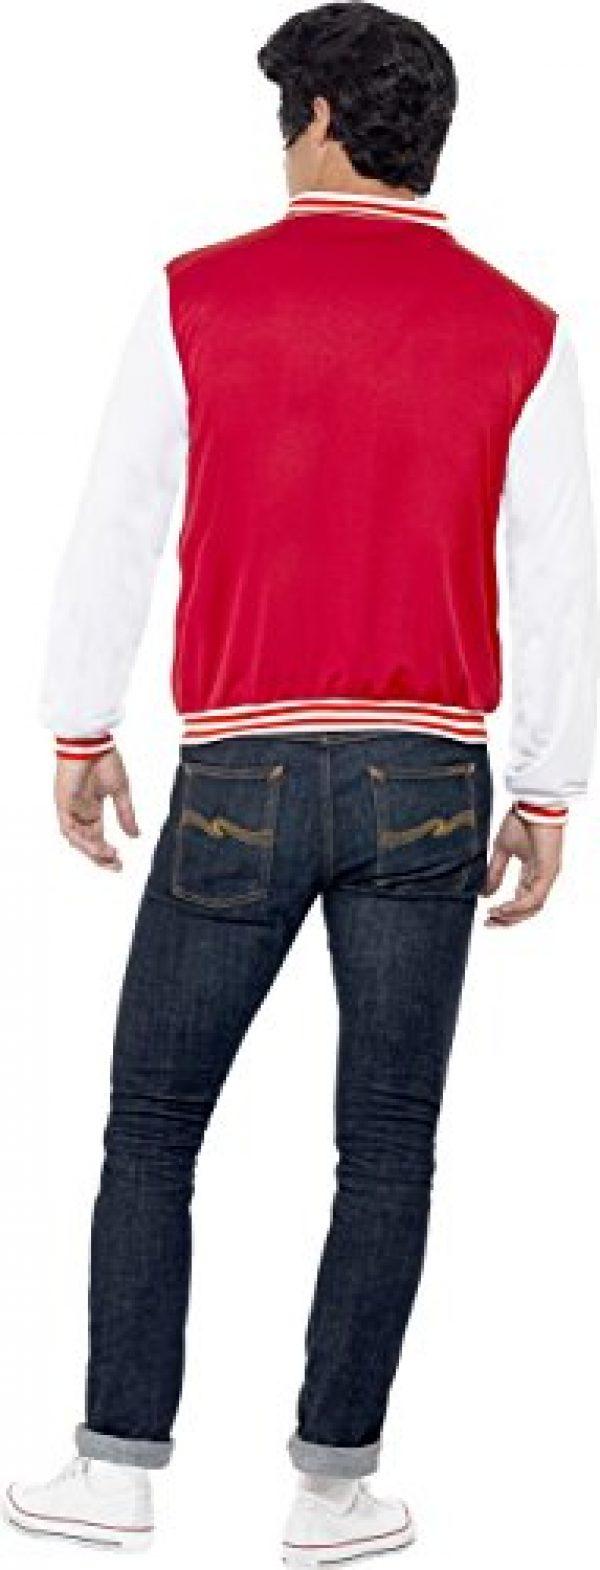 Smiffy's Men's 50's College Jock Letterman Jacket